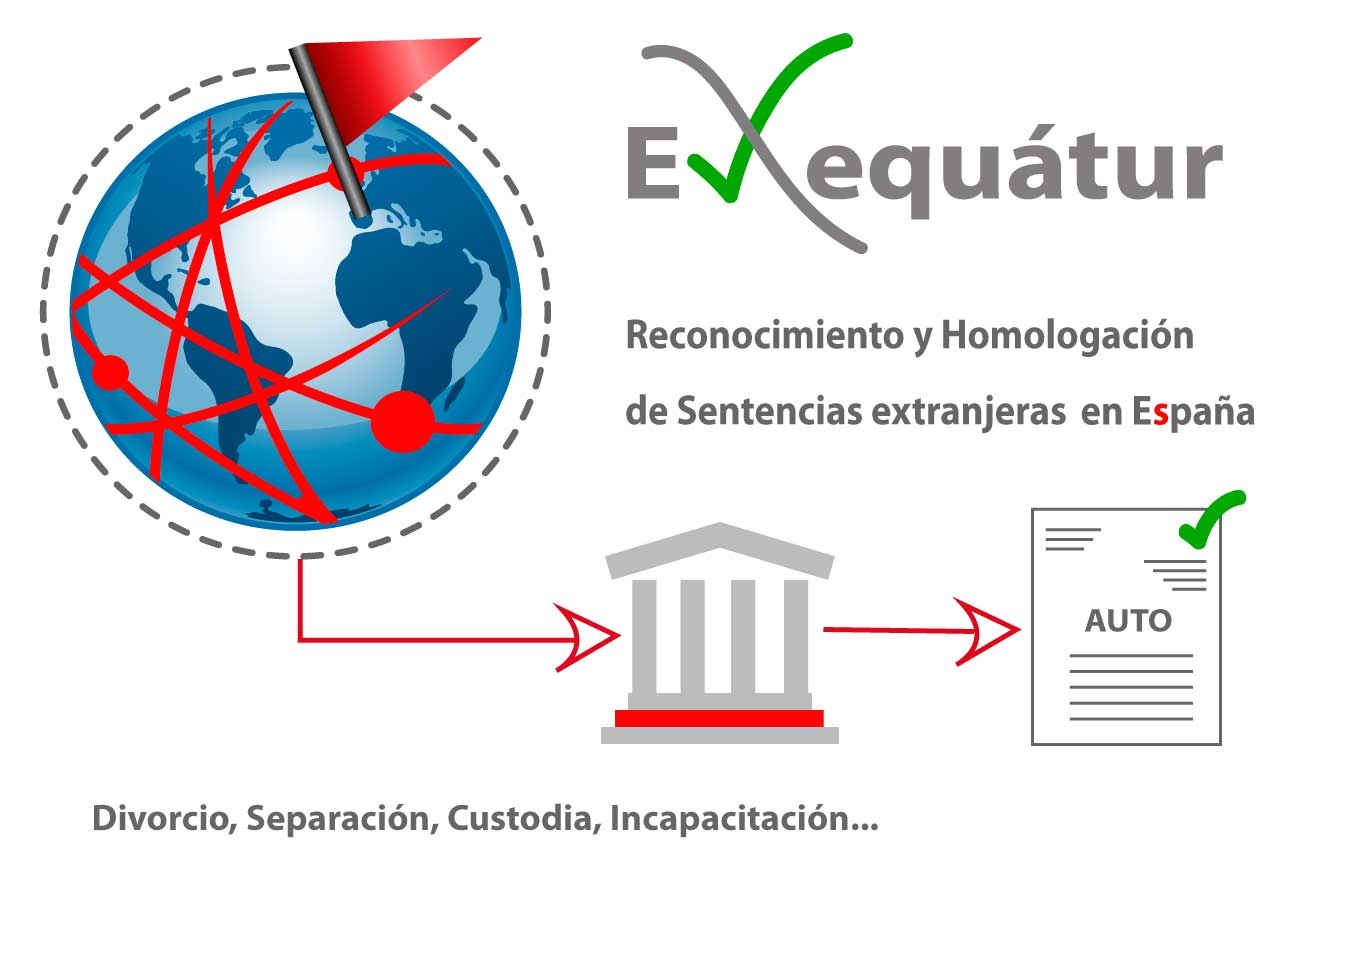 exequátur - FM abogados Tenerife - Procedimiento de exequátur en España